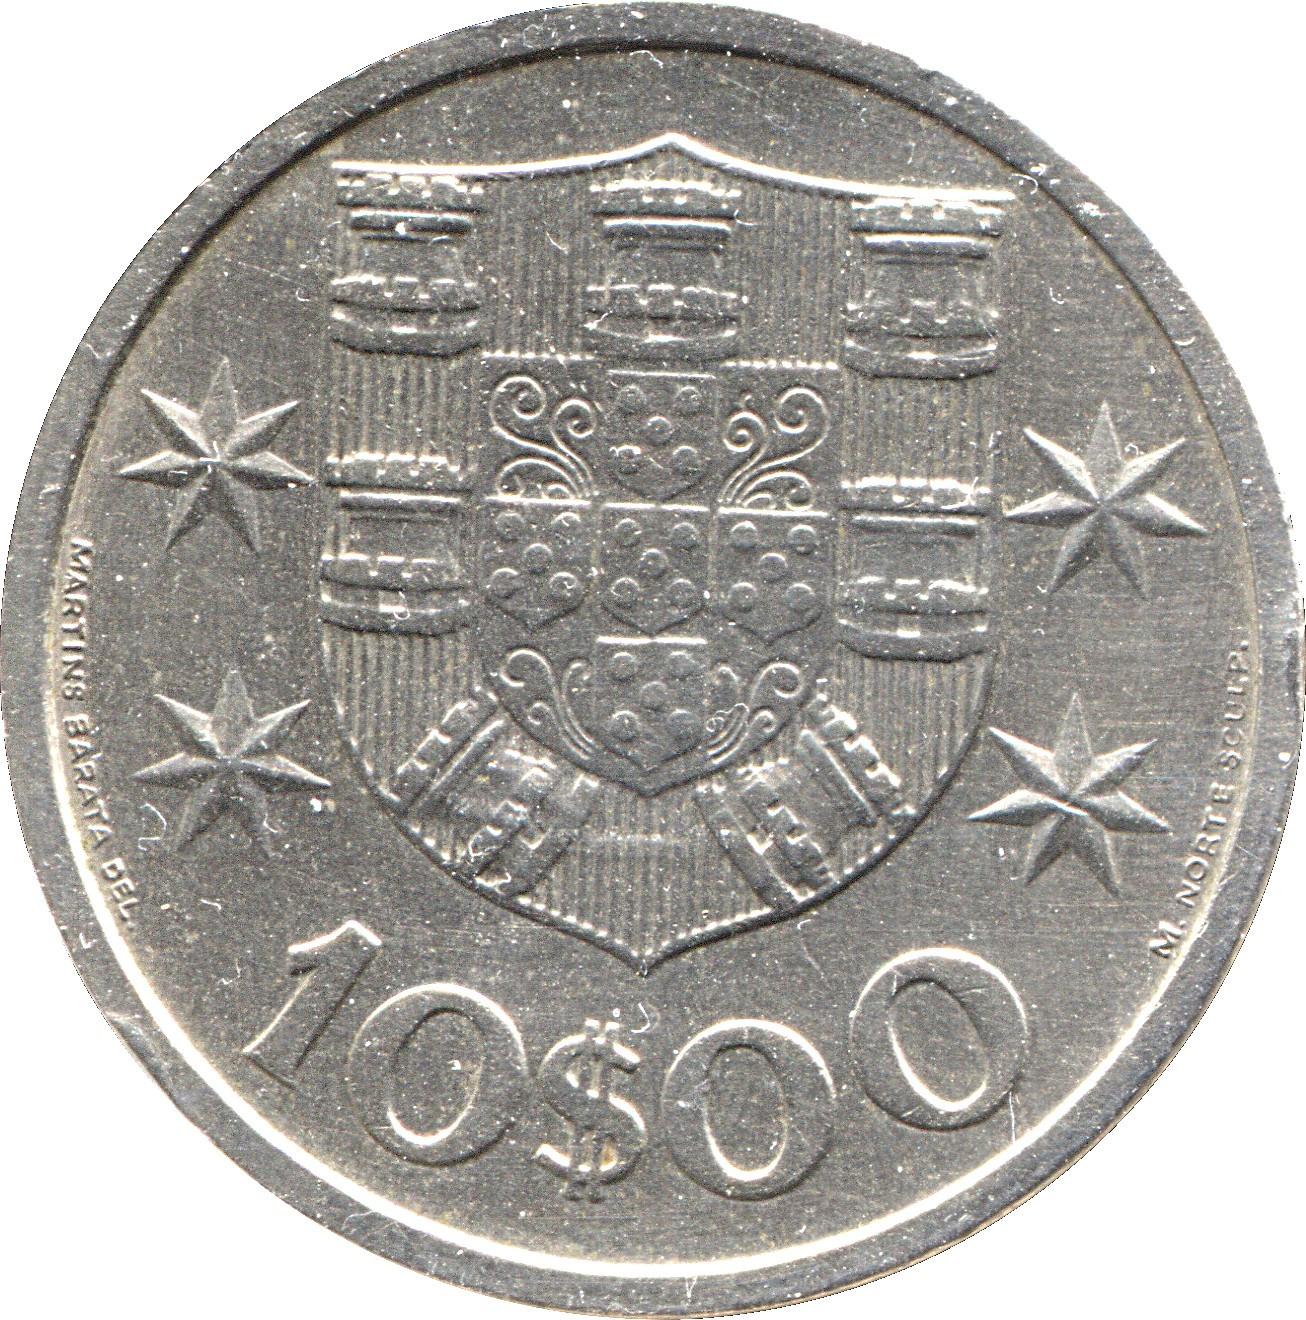 Portugal 10 Escudos (1969-1974)